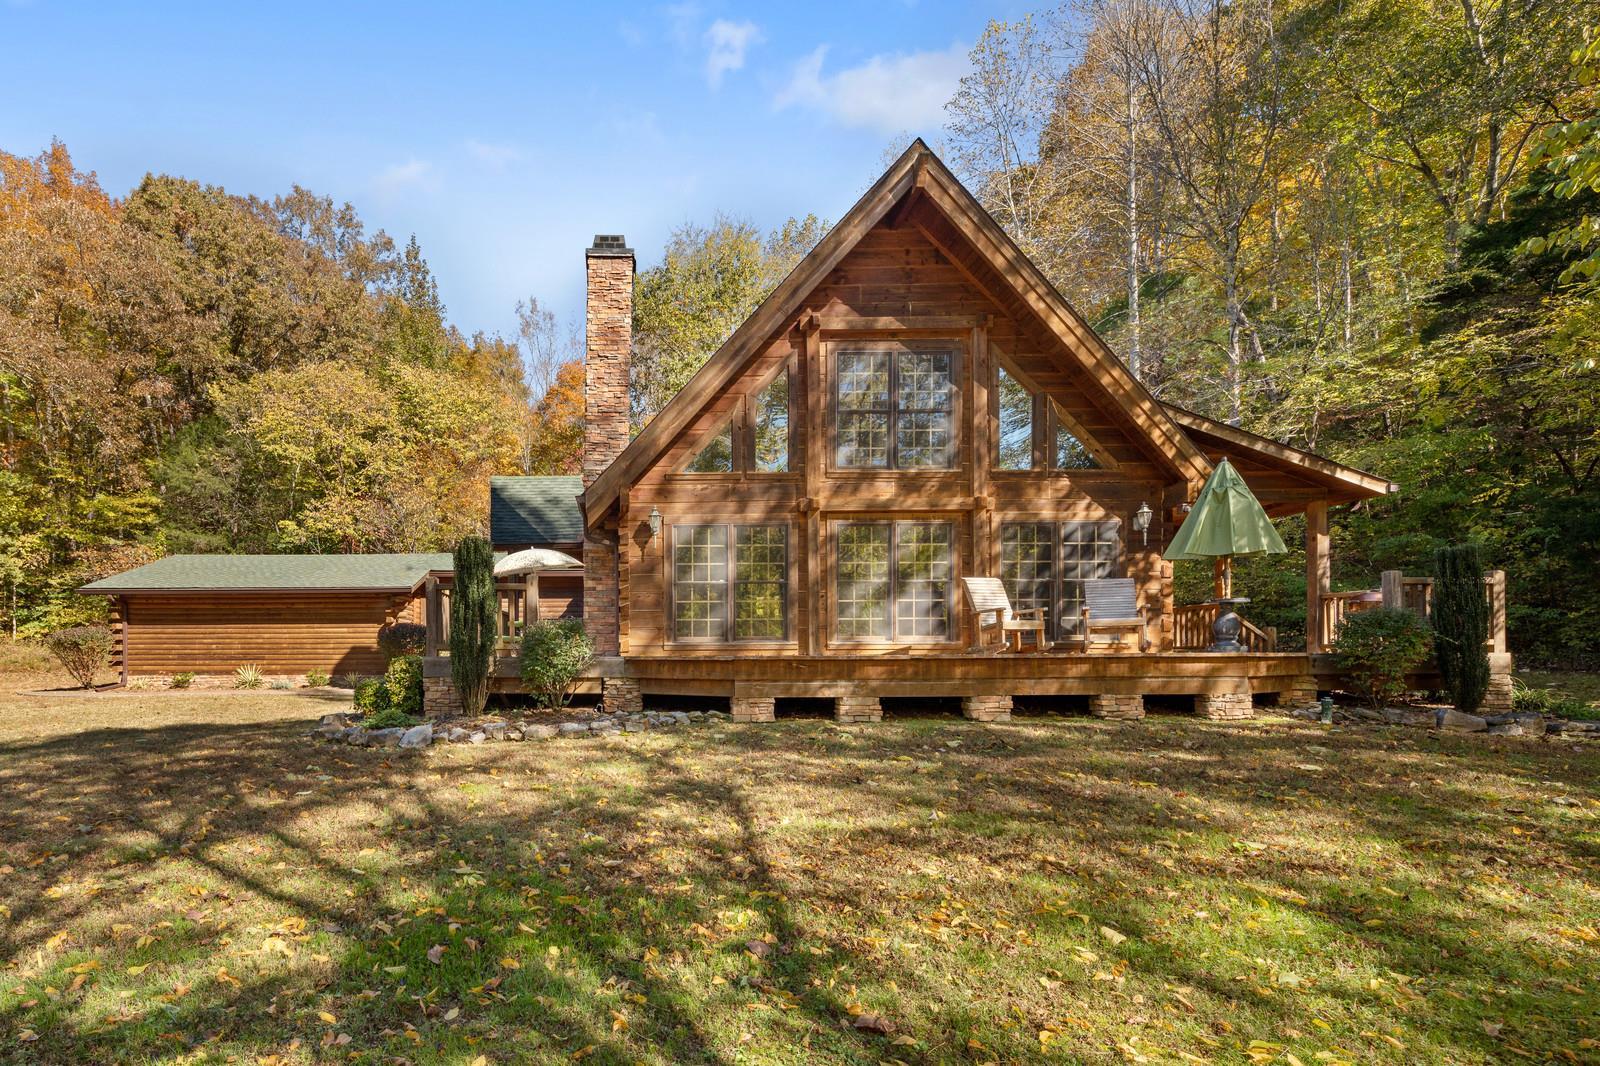 449 Lagoon Rd, Lobelville, TN 37097 - Lobelville, TN real estate listing